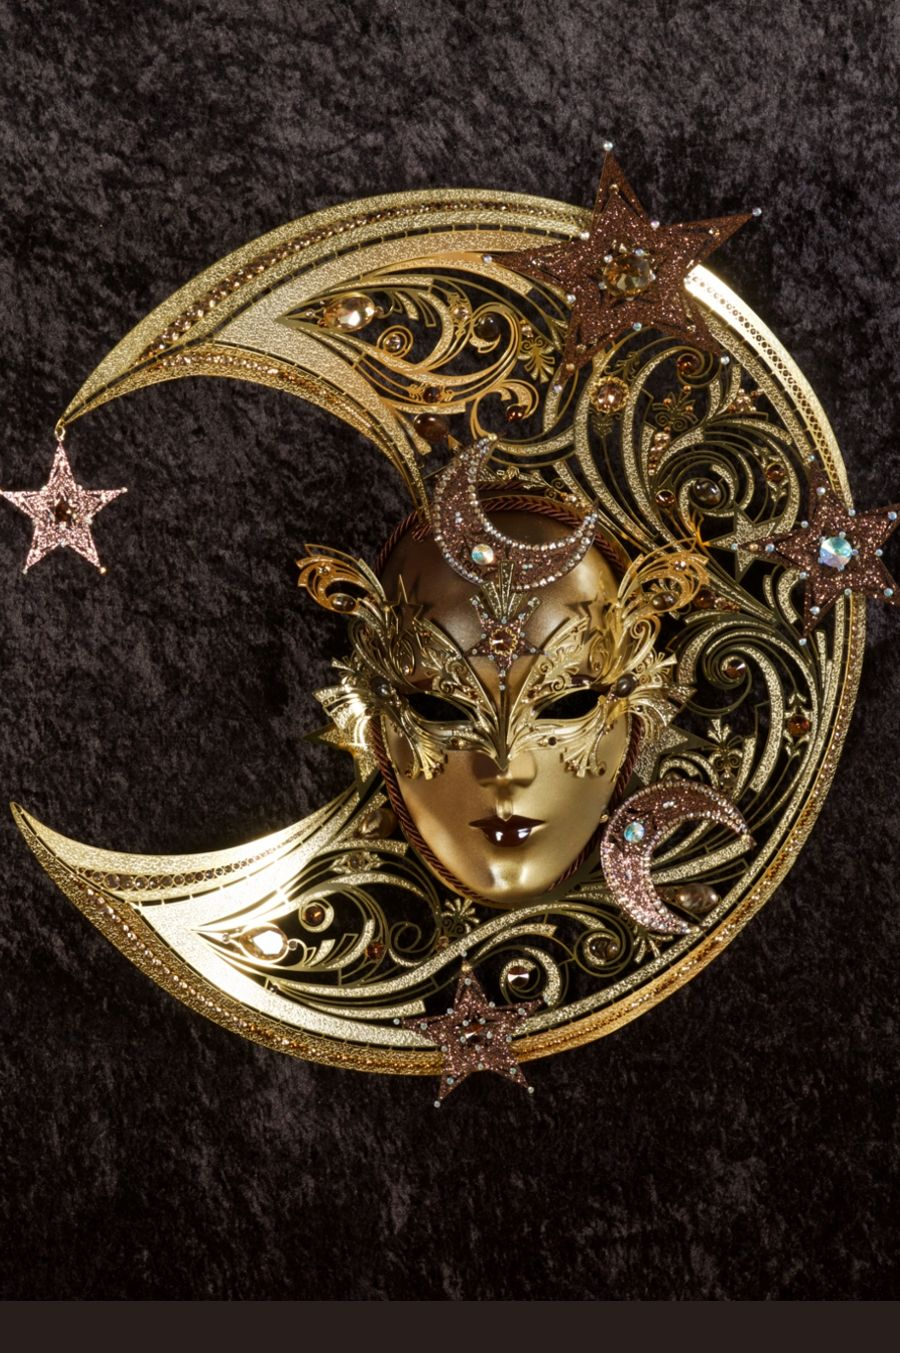 Celestial maschera veneziana 52cf6c7fdc5a